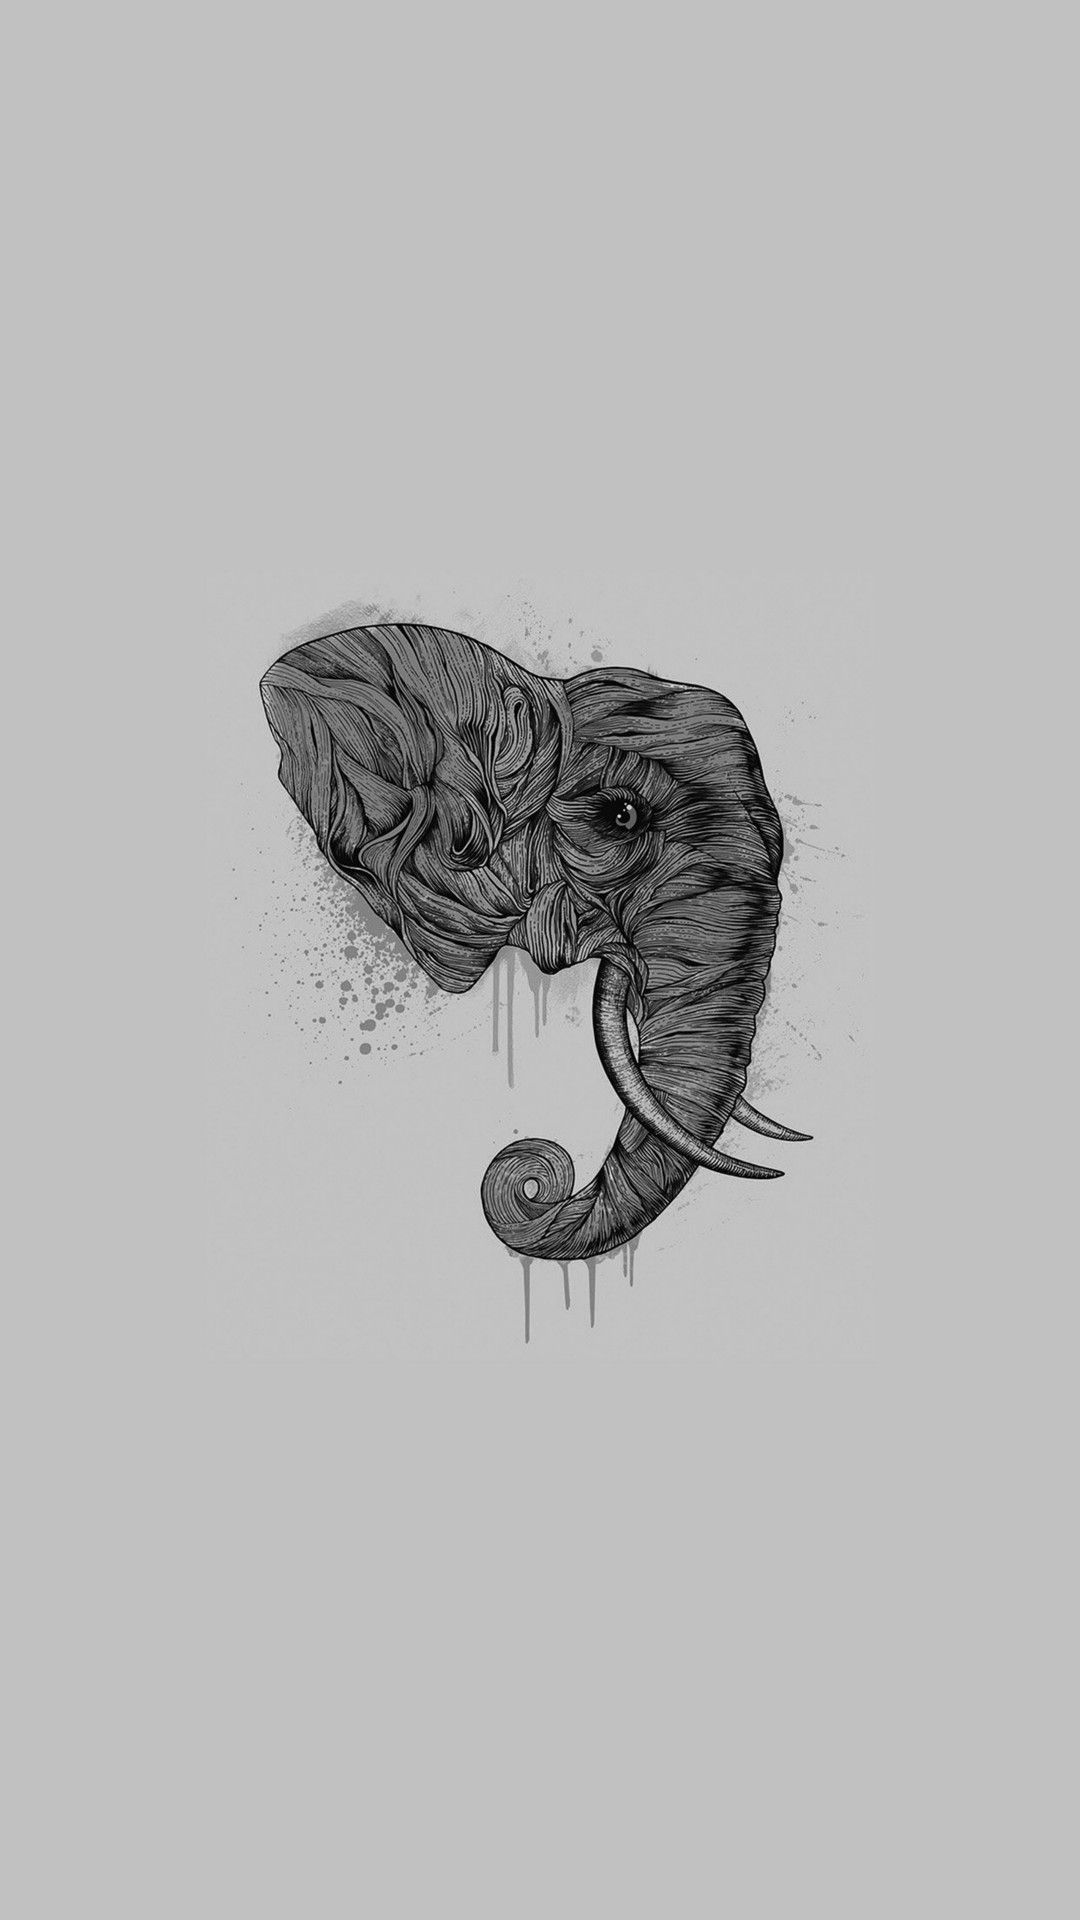 Elephant iphone wallpaper tumblr - Elephant Art Ddark Illust Drawing Animal Iphone 6 Plus Wallpaper